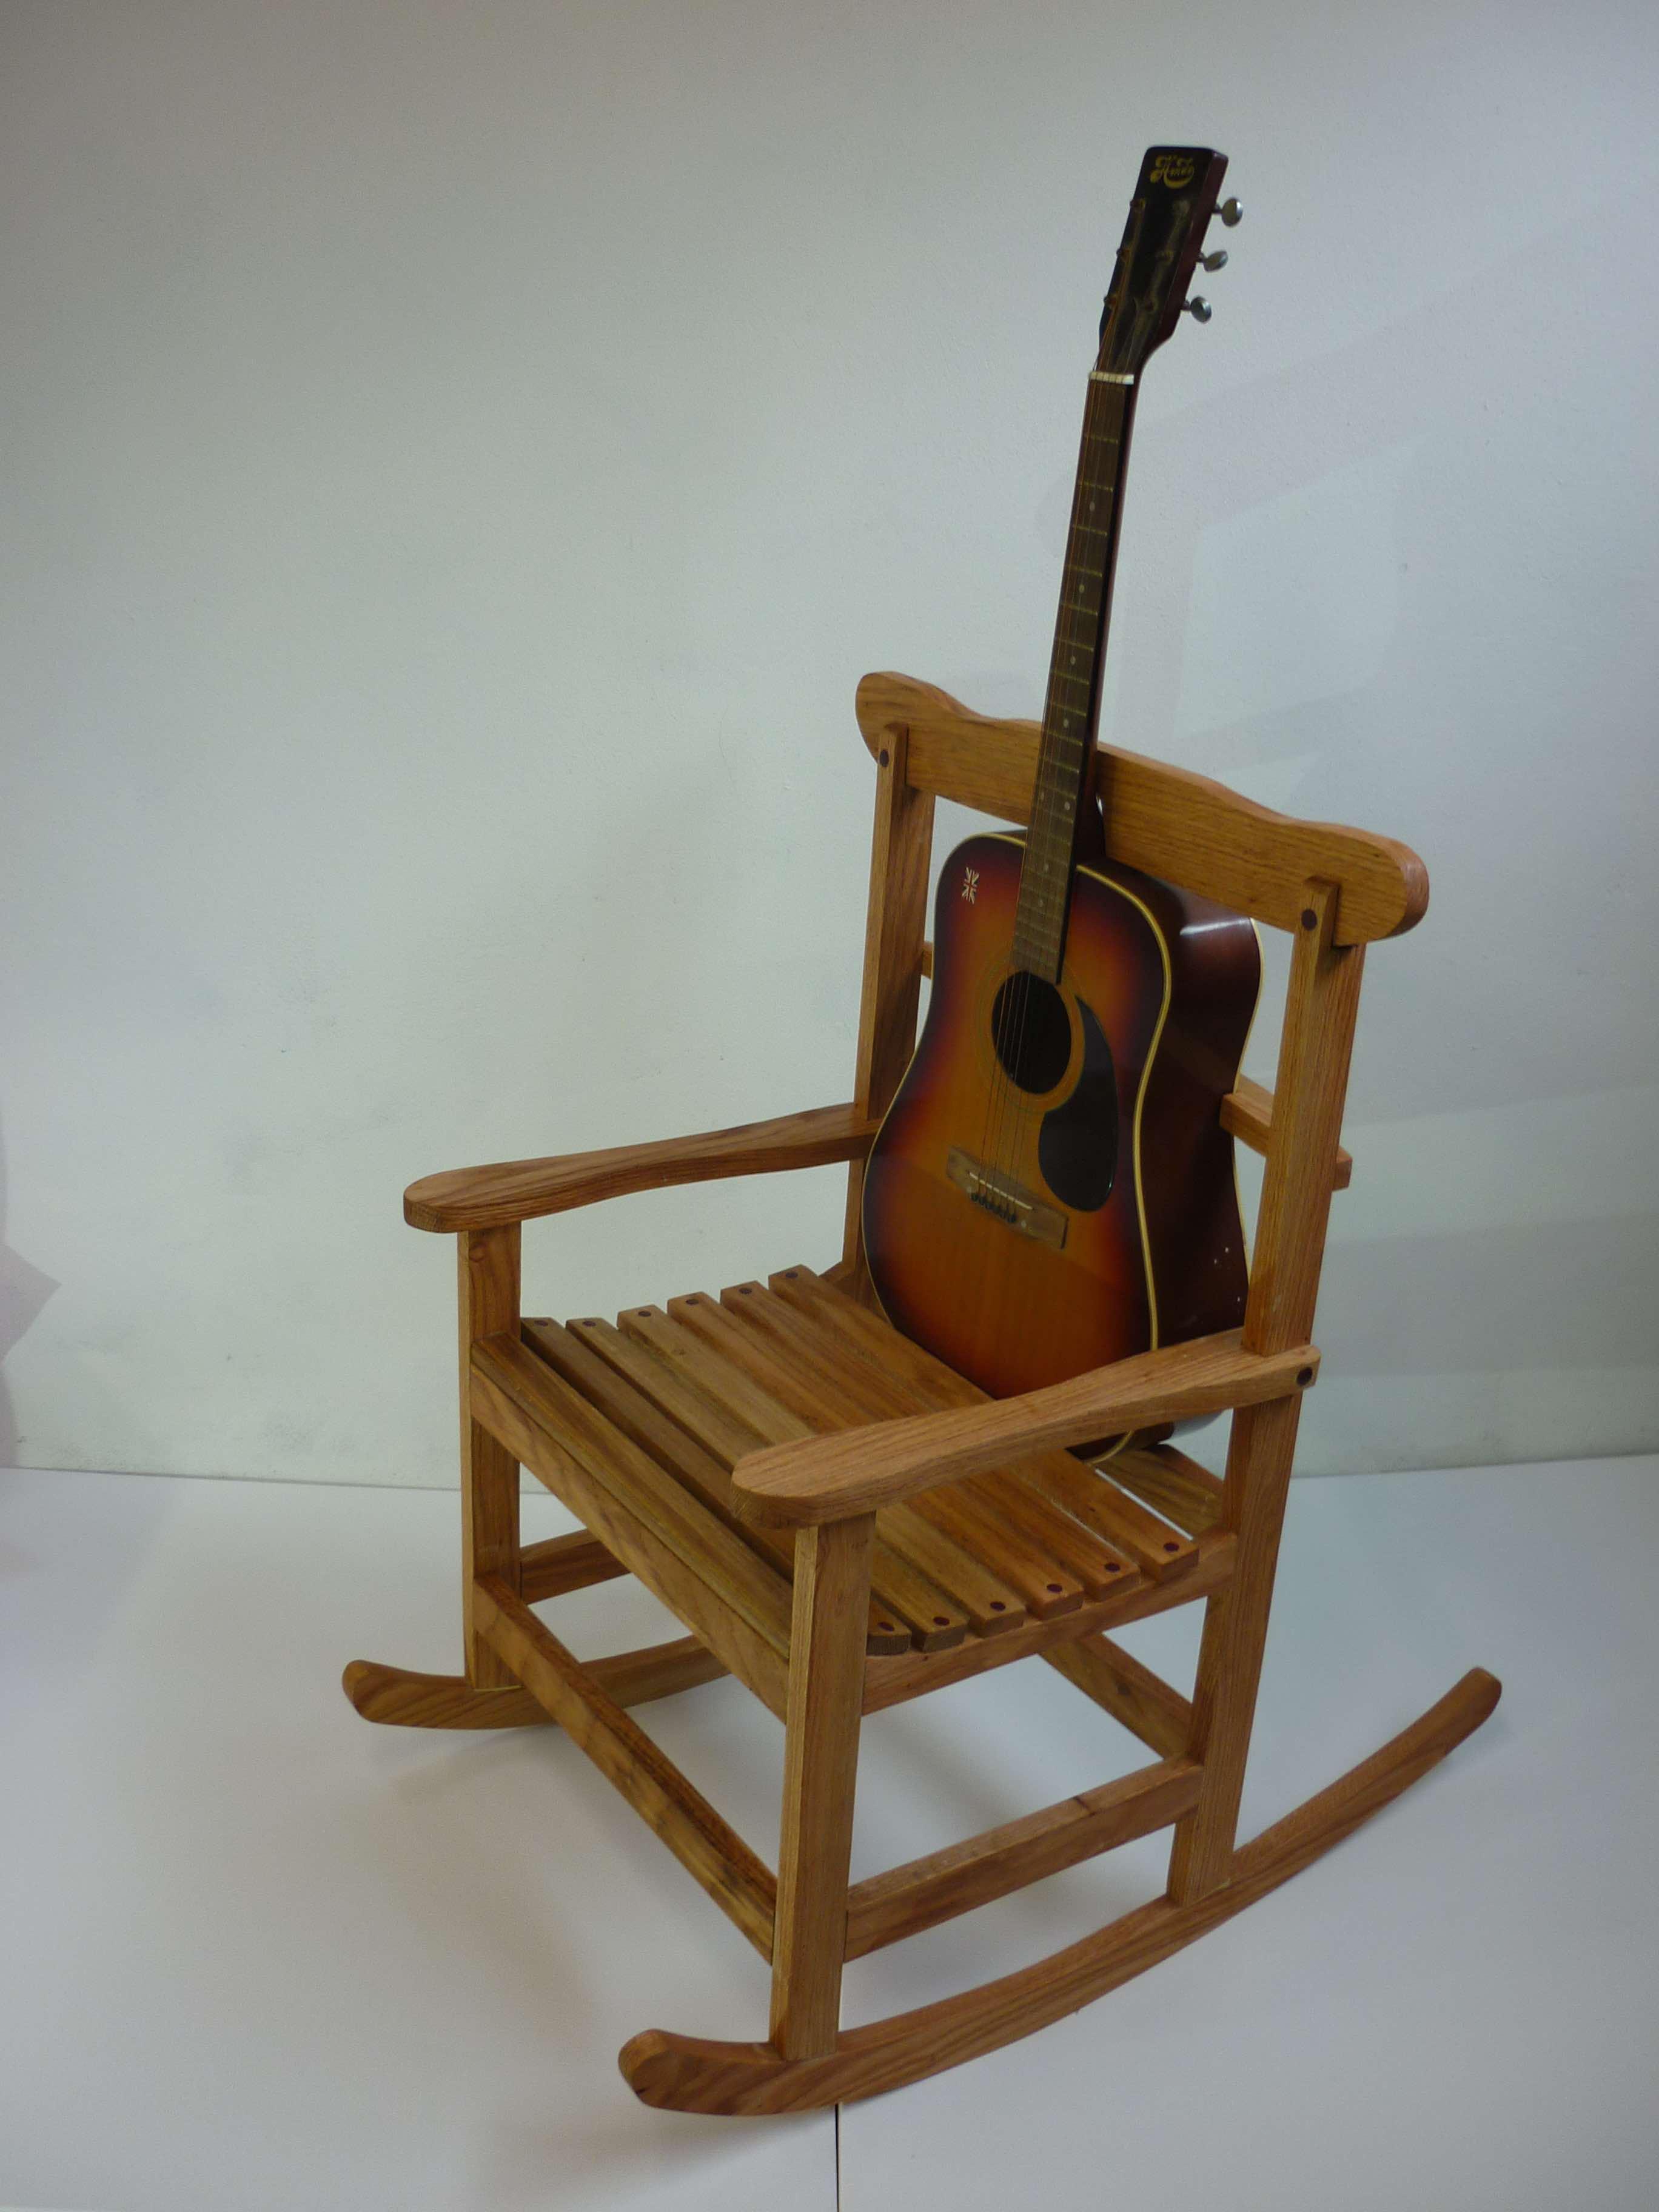 Rock'n'Roll Chair - Jeff Perks